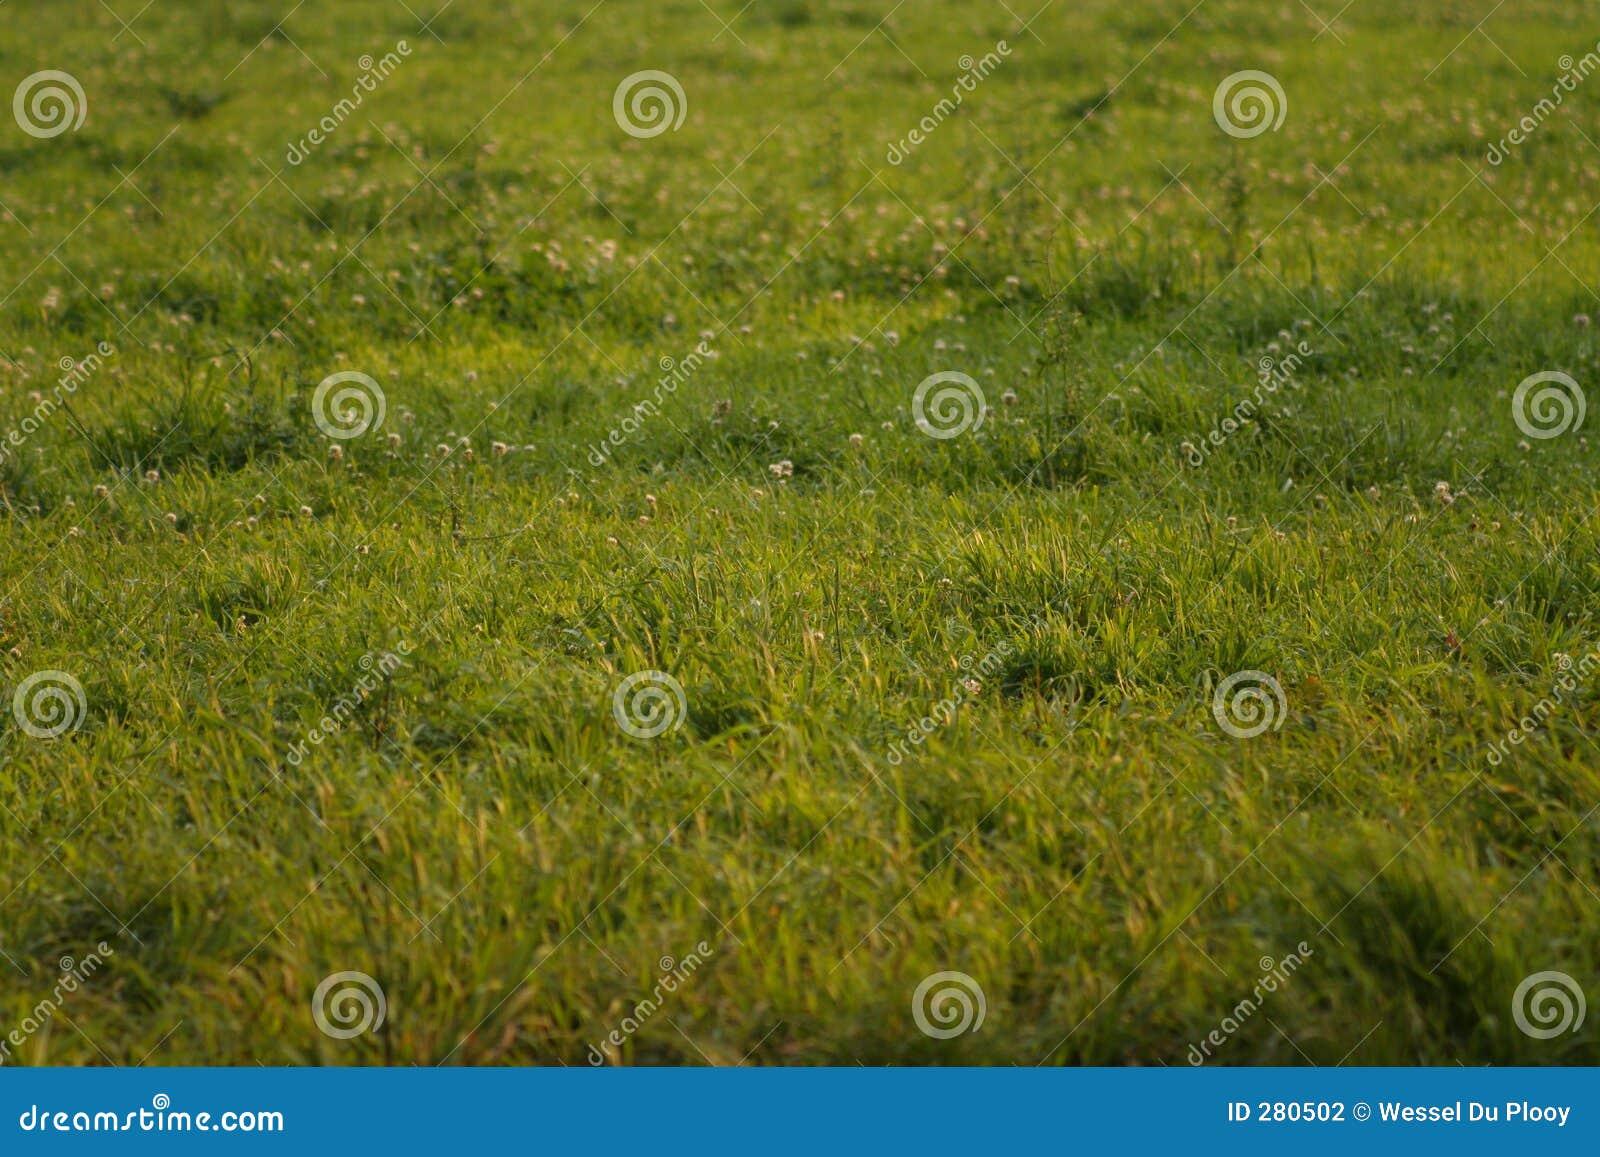 Groene gebieden